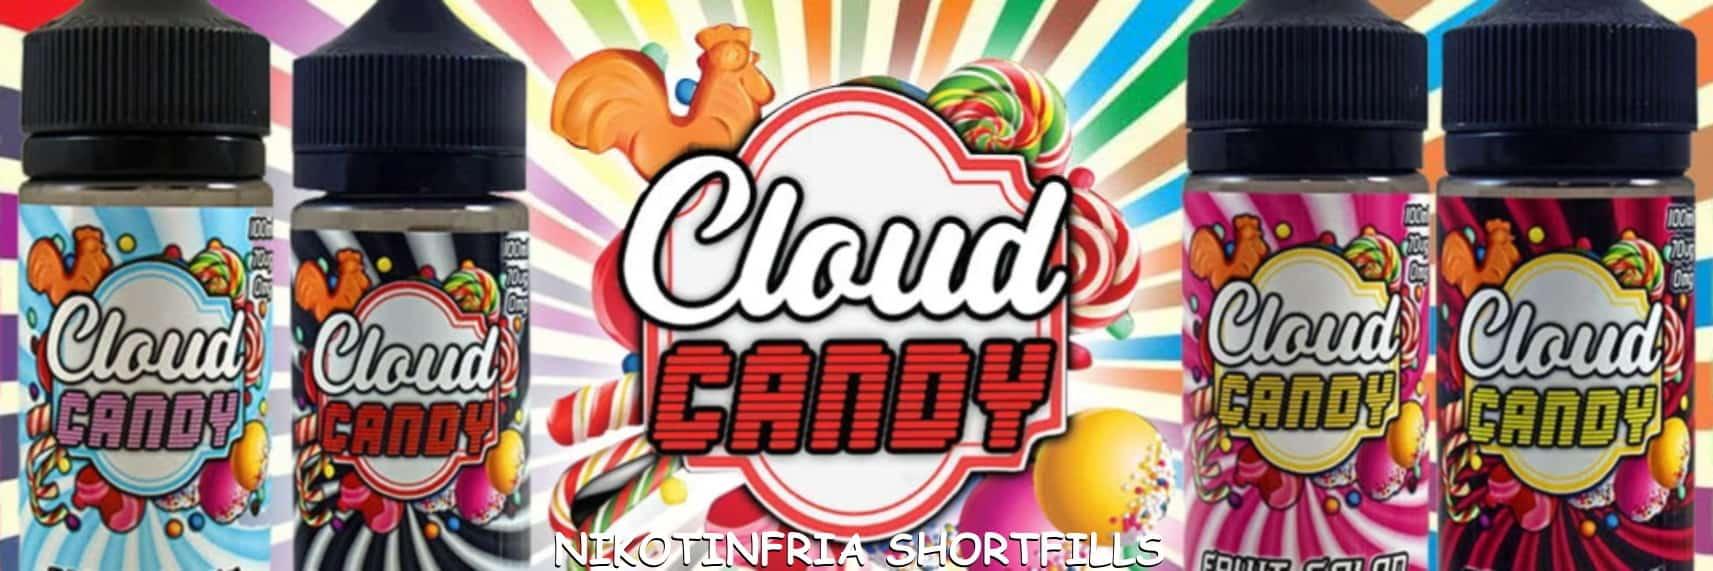 Cloud Candy Slide